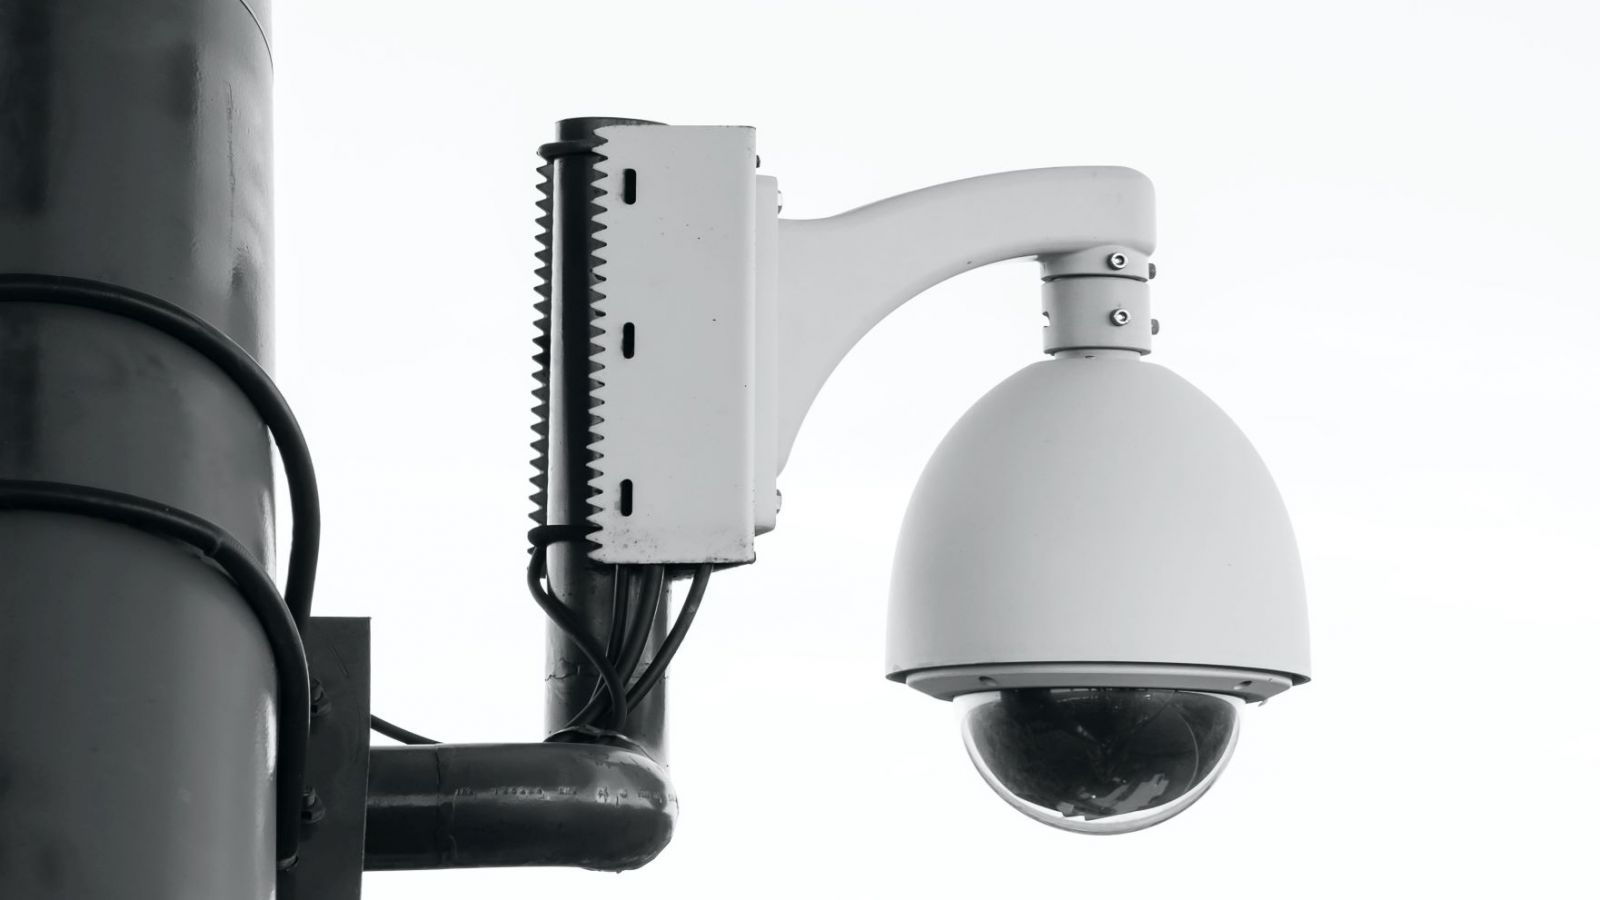 CCTV Maintenance Checklist Log